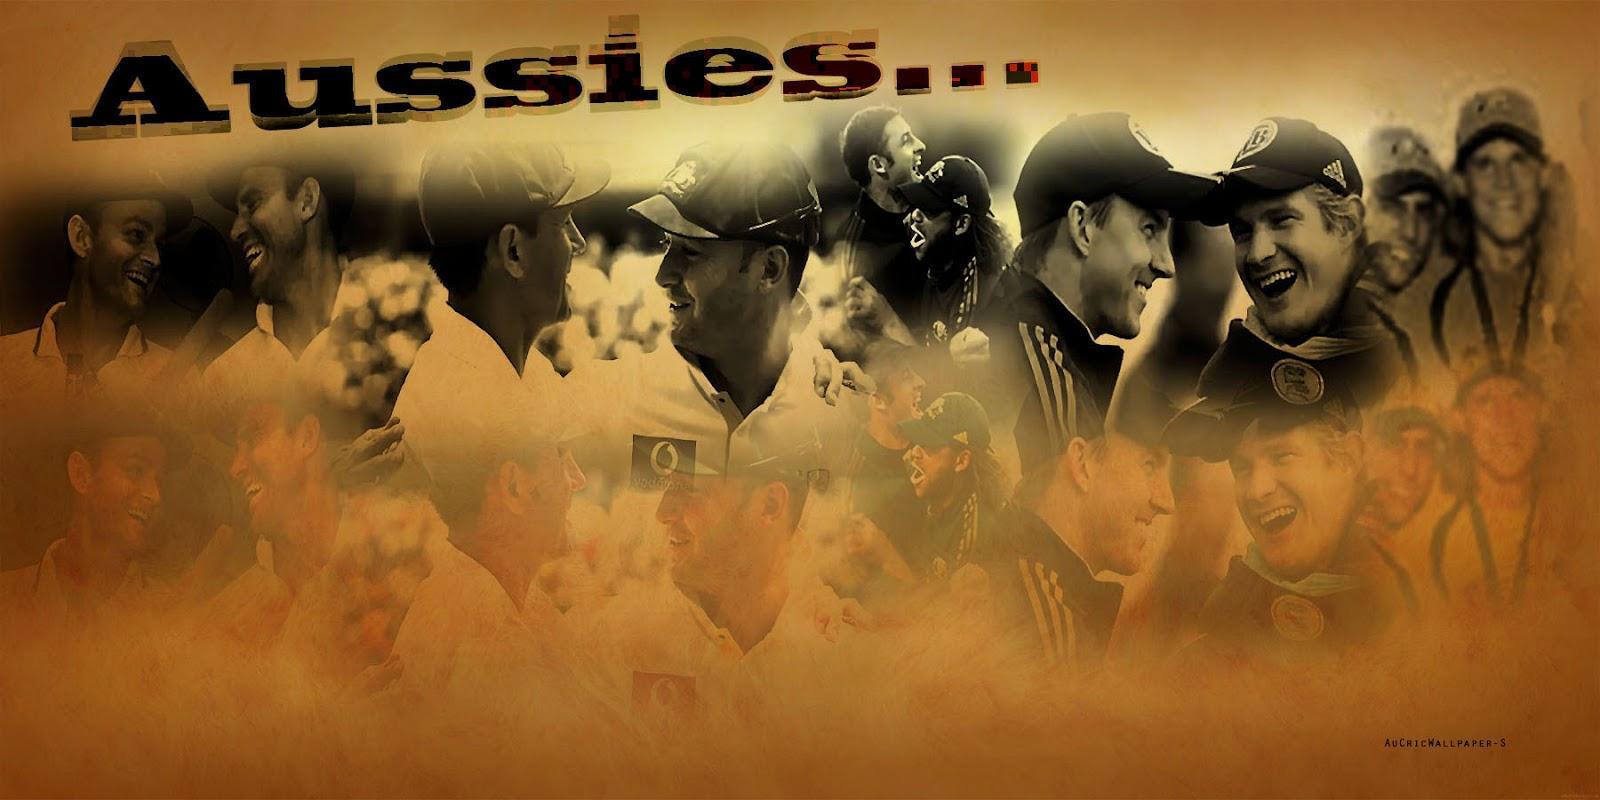 Australian Cricket Team Background 8